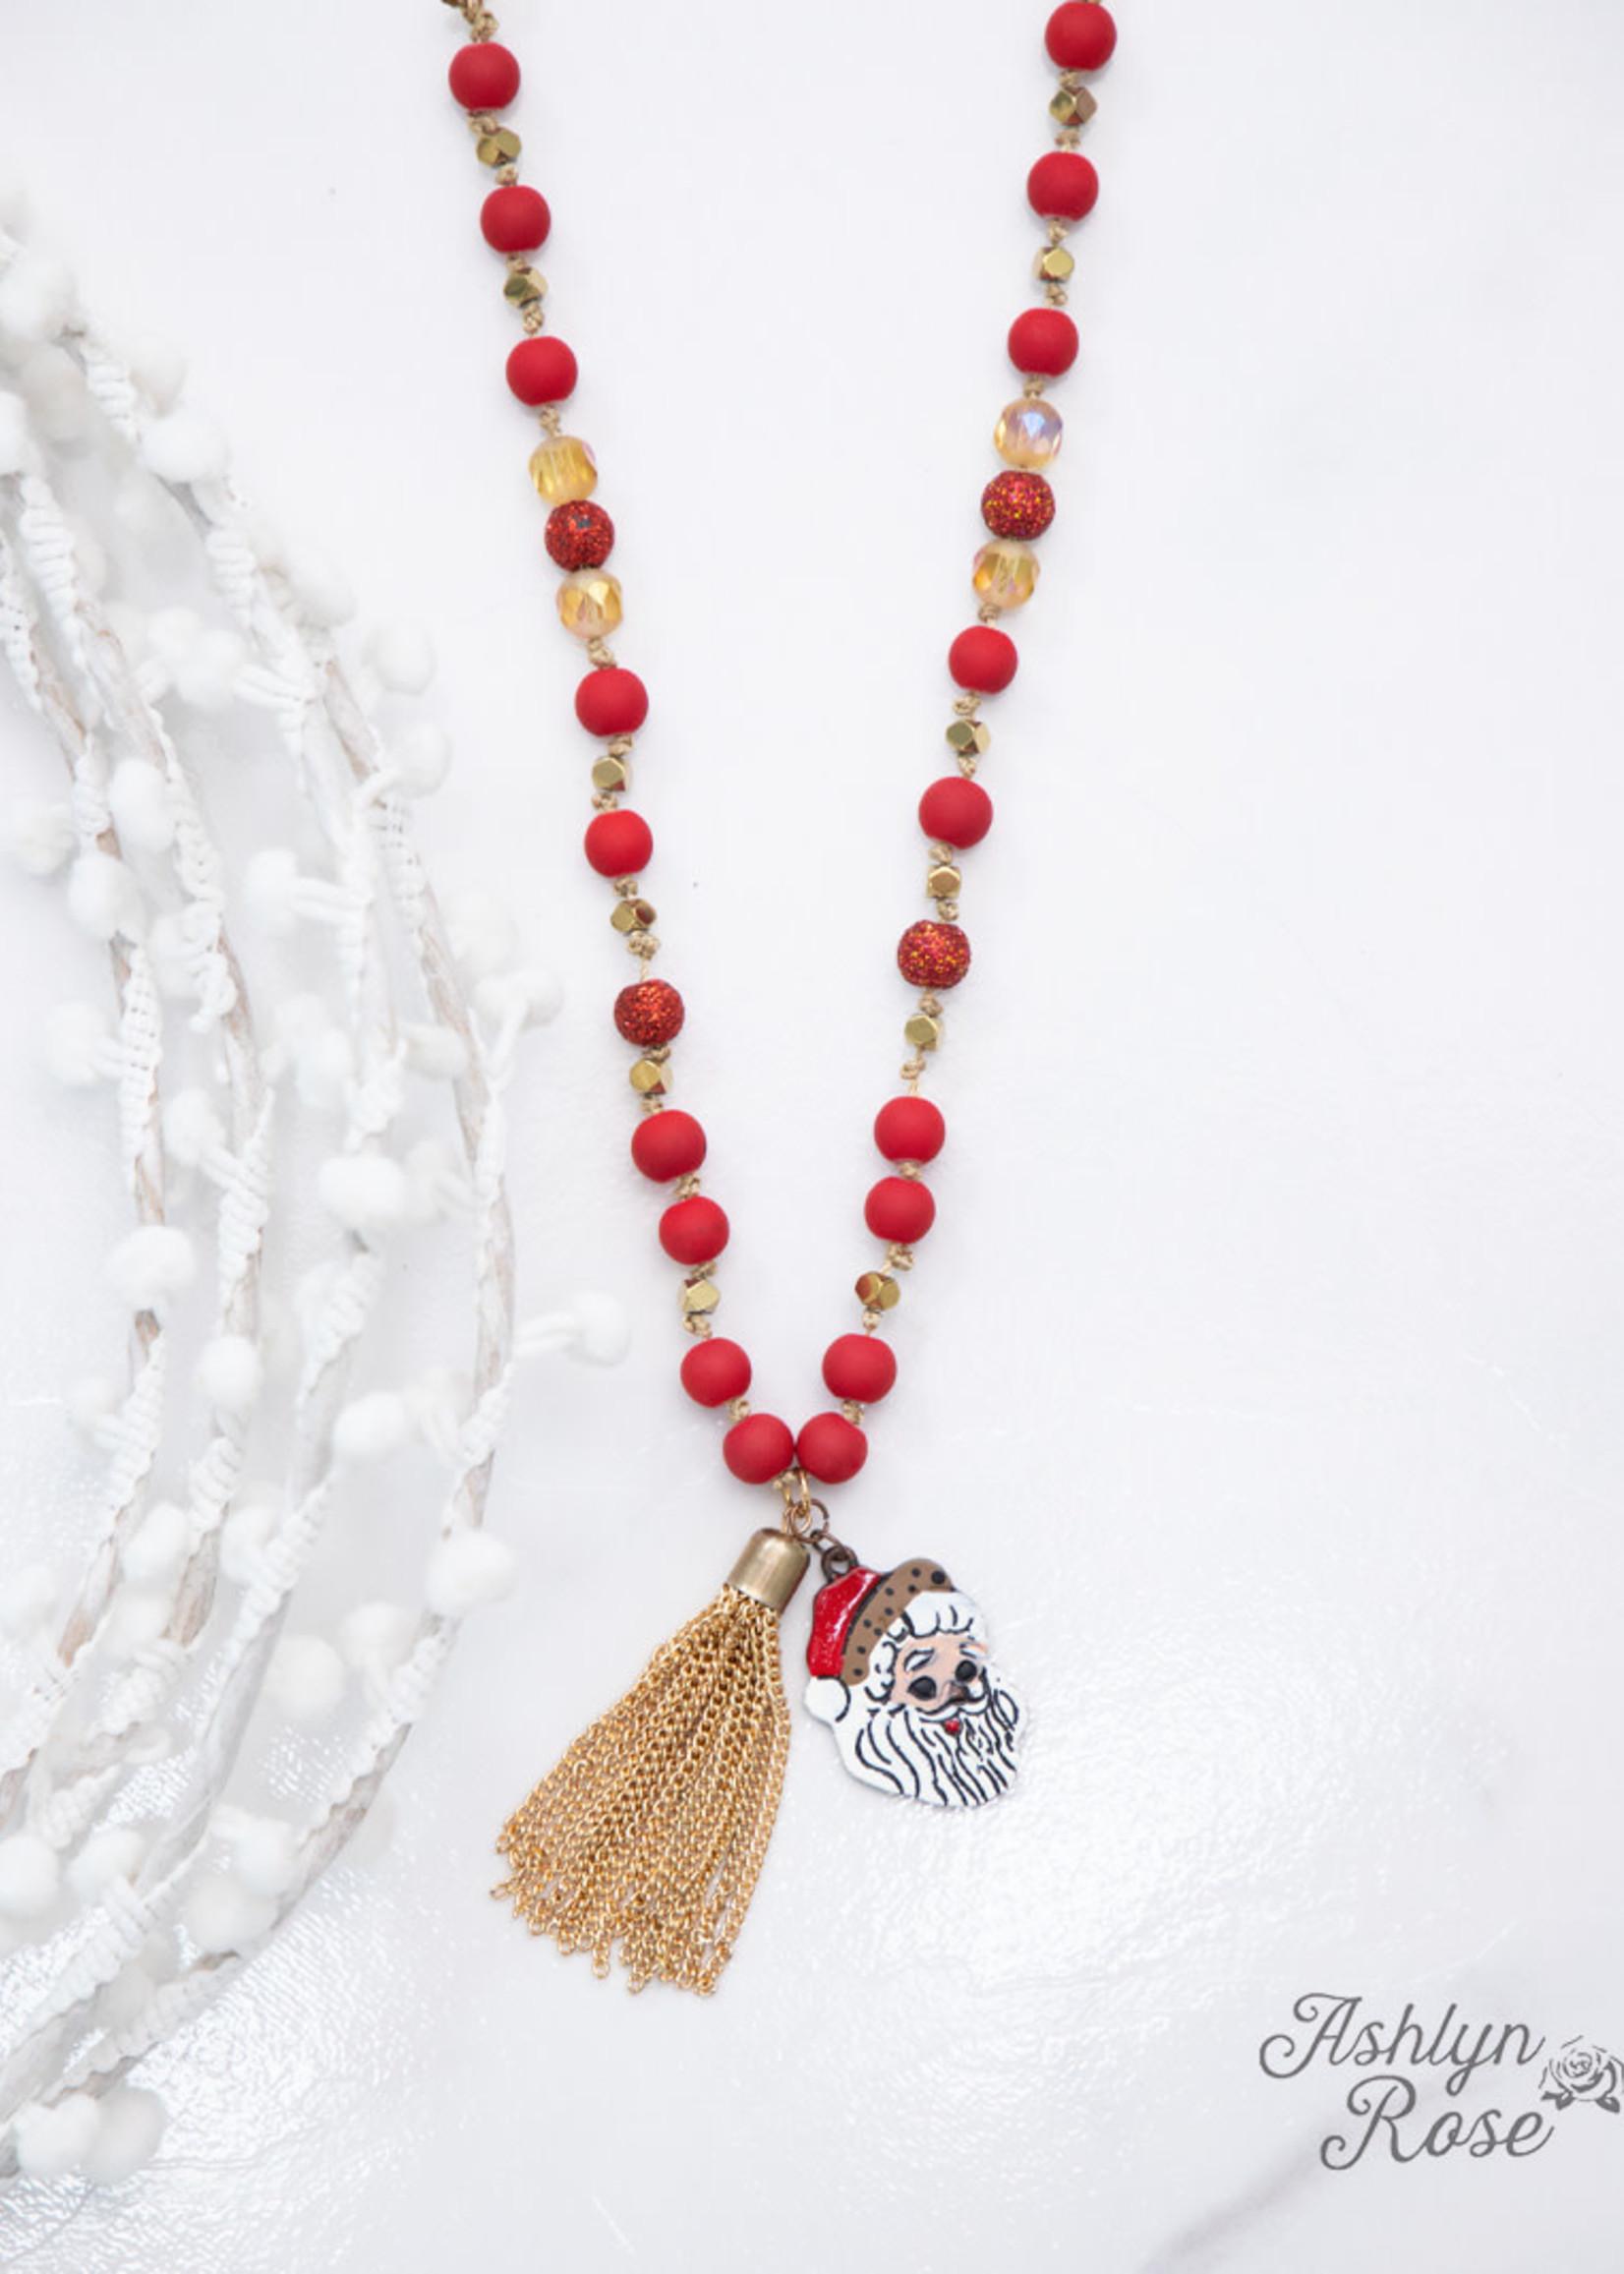 Christmas Beaded Necklace w/ Tassel & Pendant